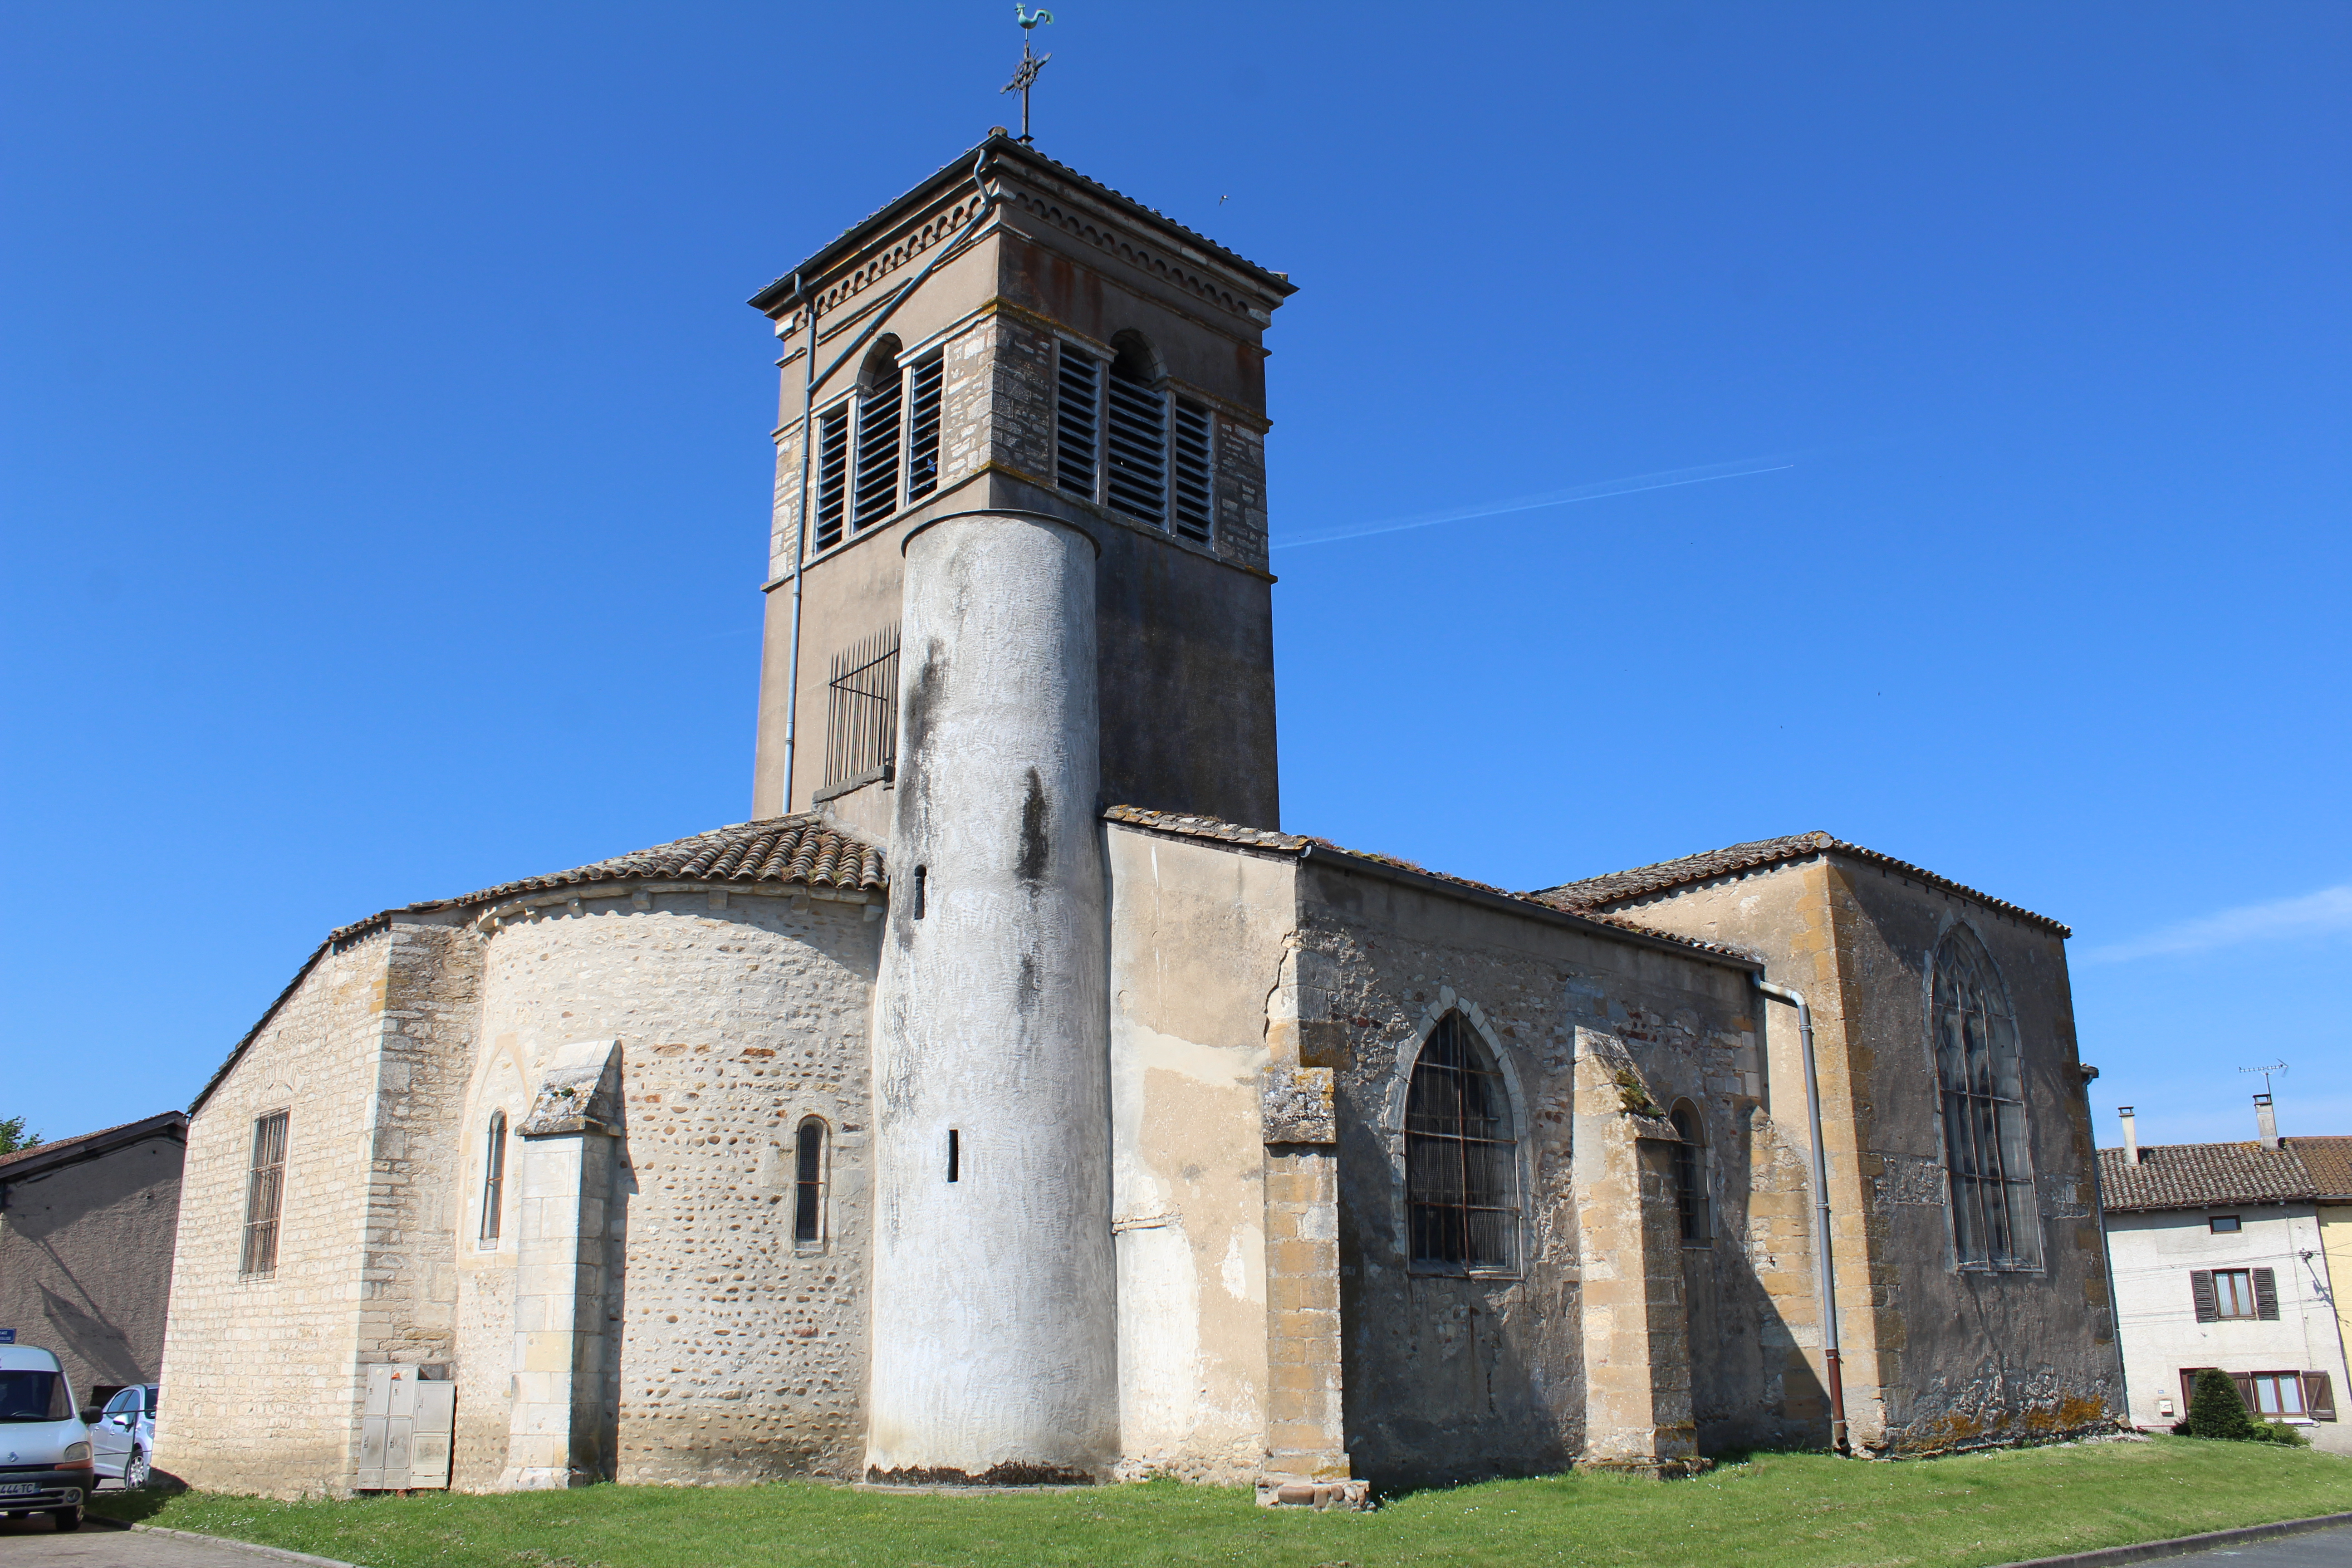 Messimy-sur-Saône